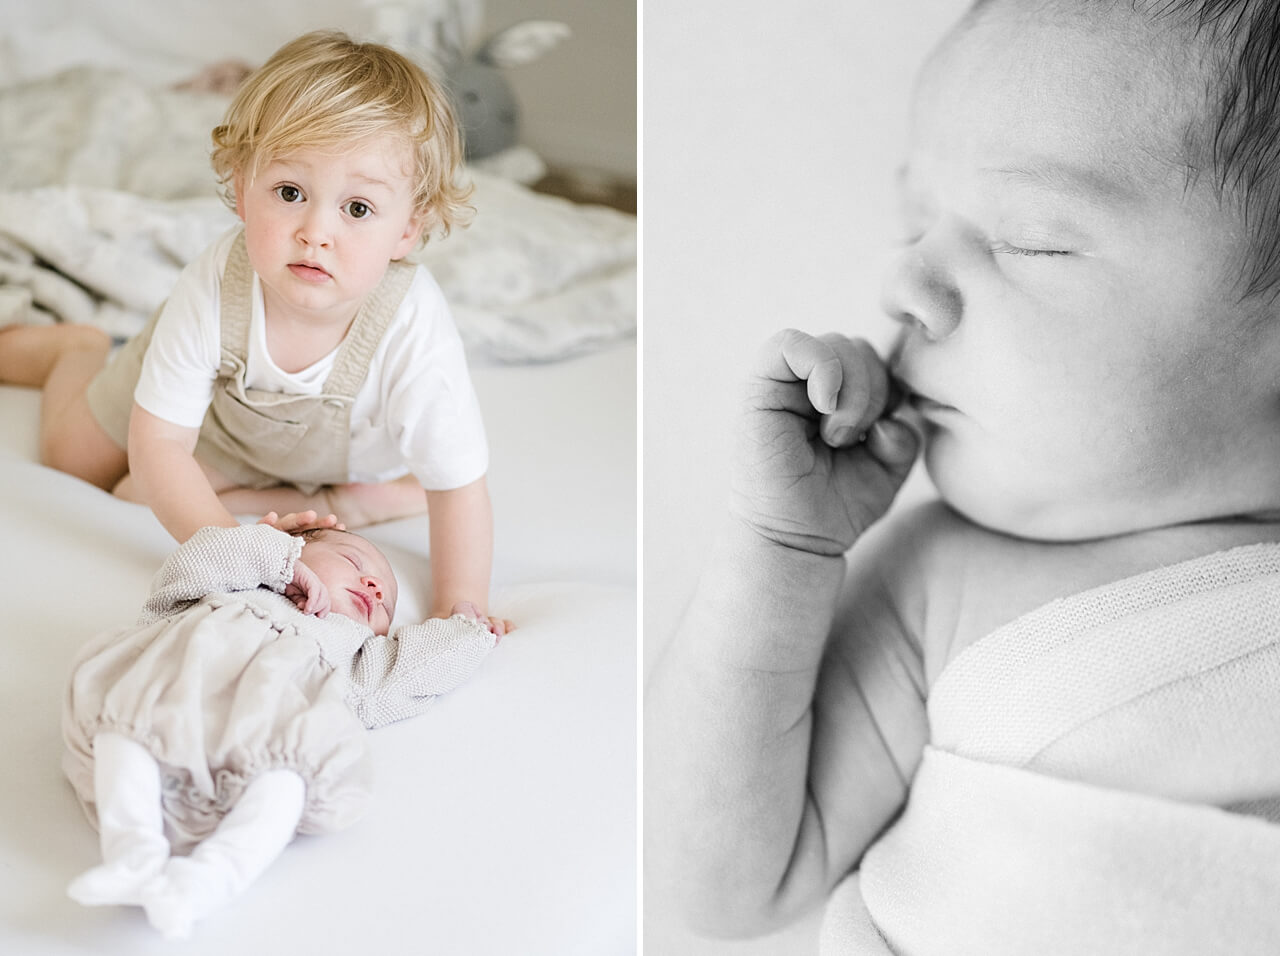 Rebecca Conte Fotografie: Zarte Neugeborenenbilder 06